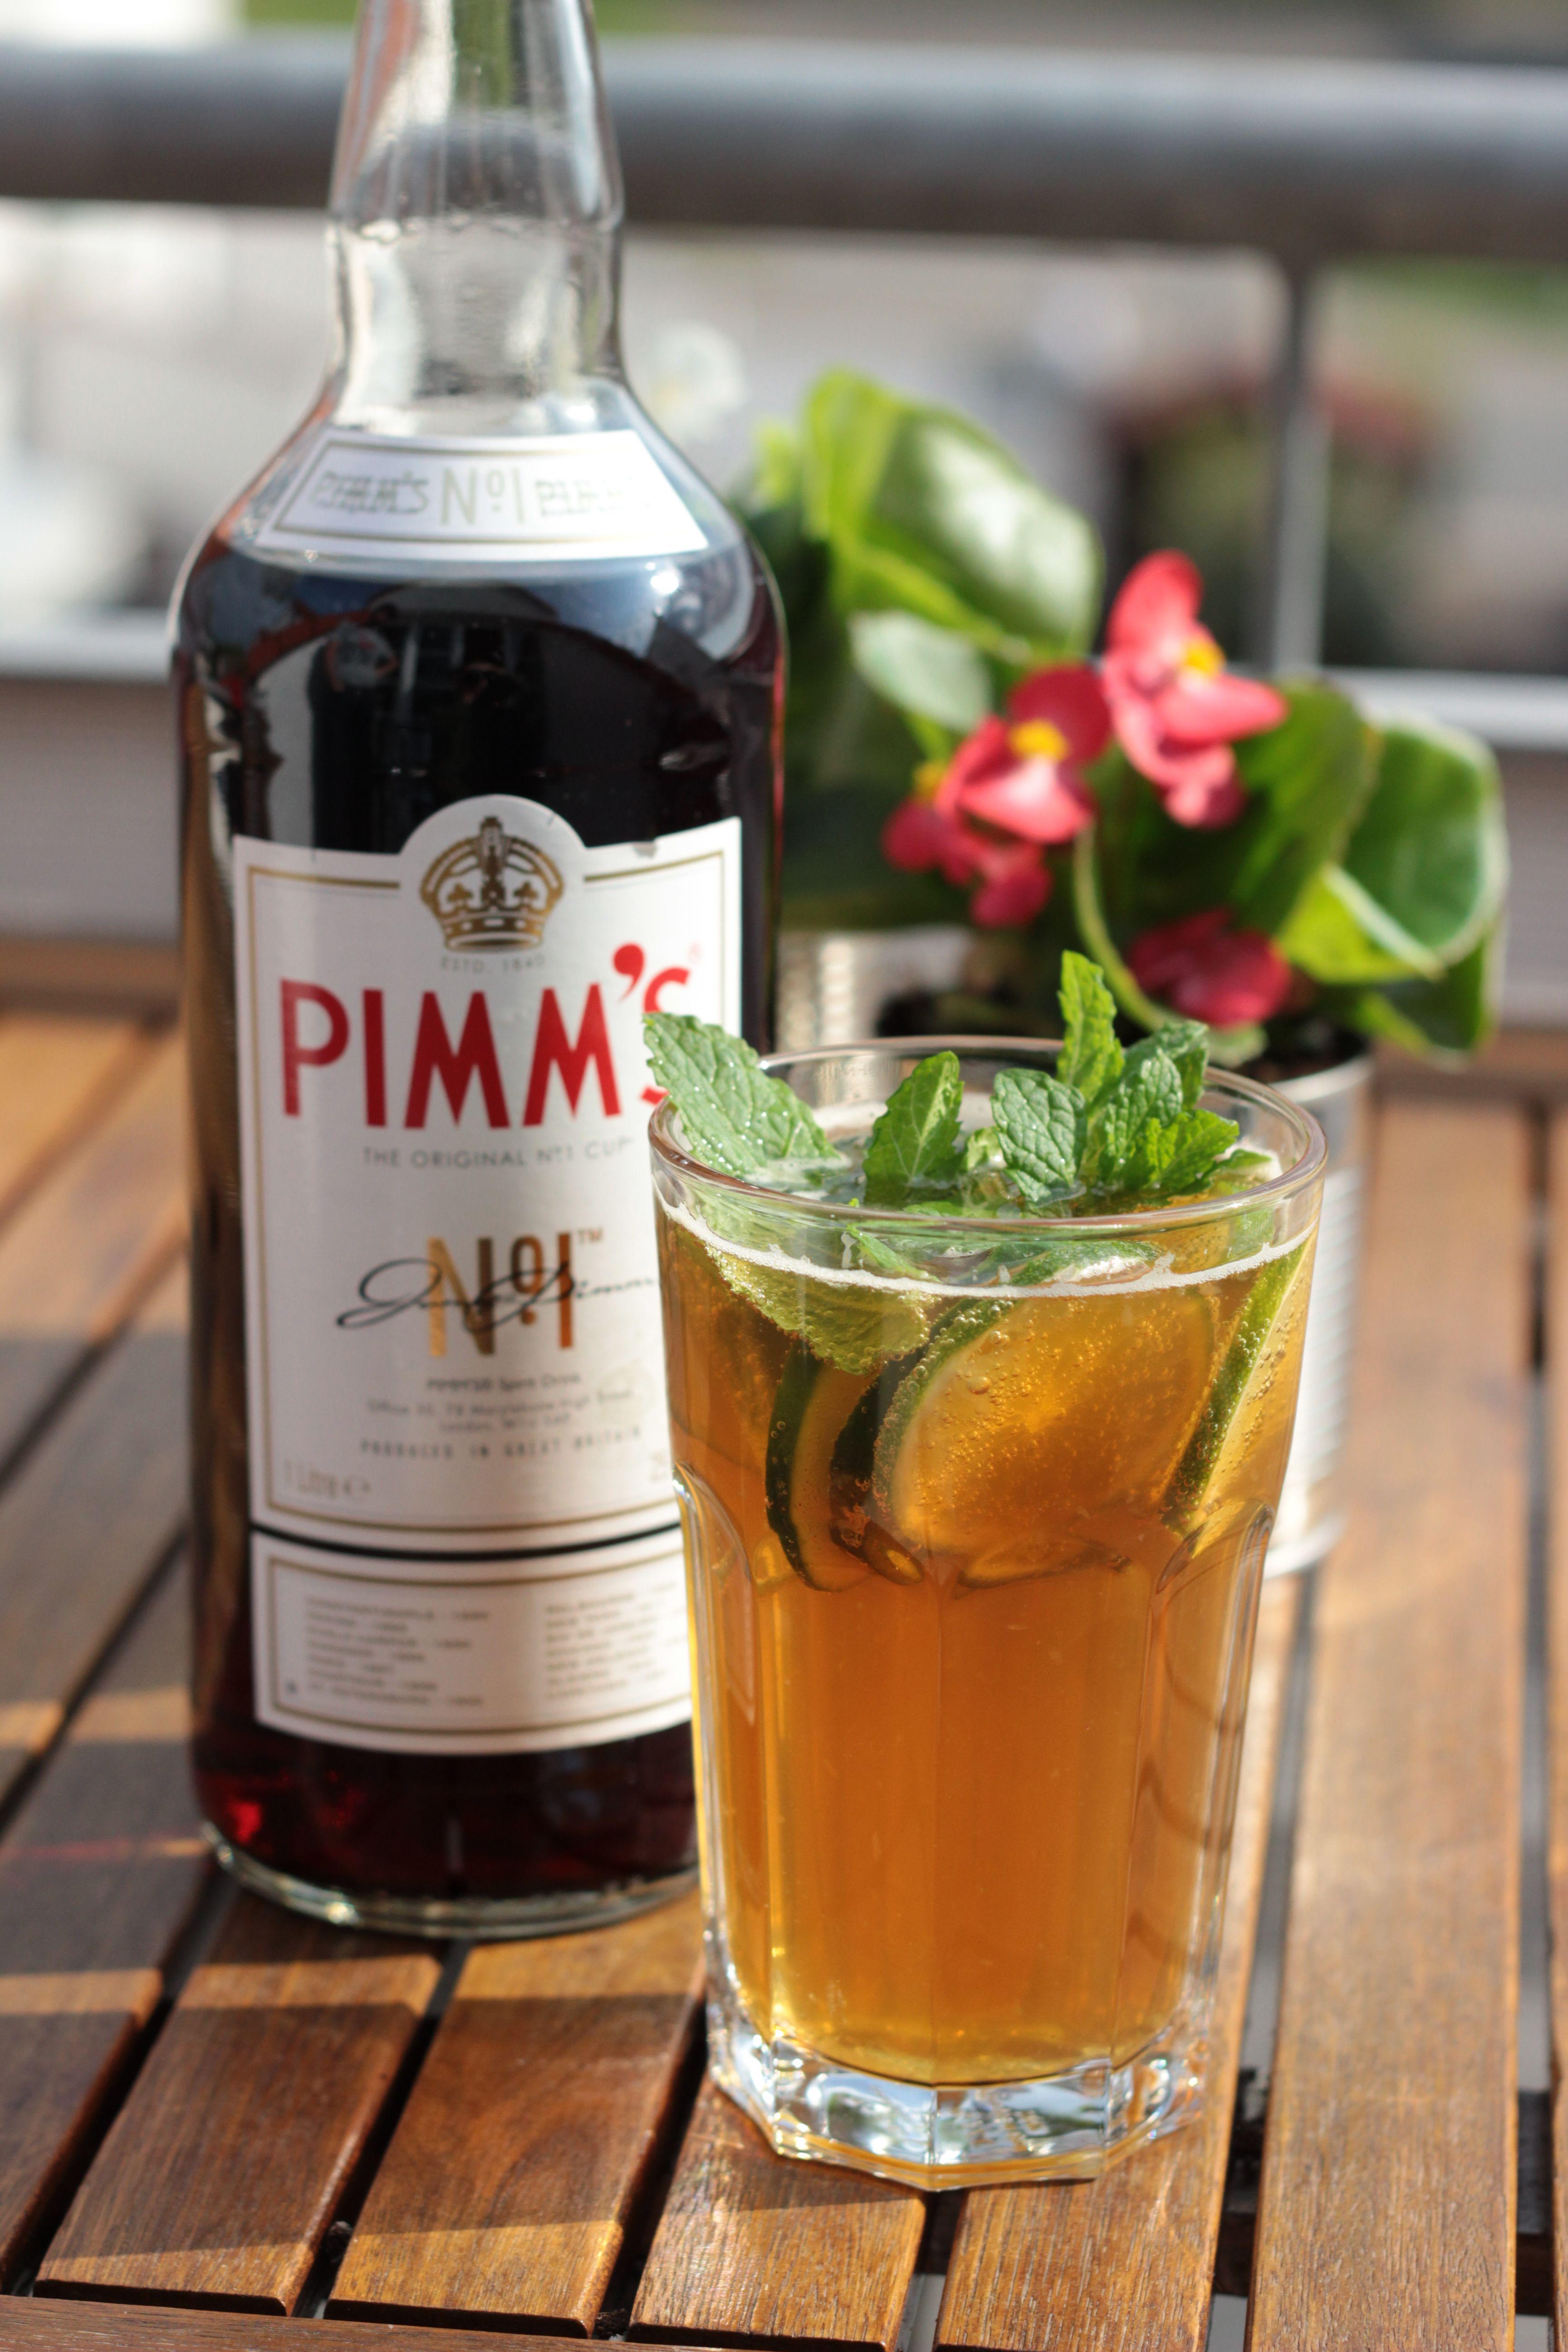 Pimm's No. 1 oder mein Cocktail für laue Frühlingsabende #refreshingsummerdrinks